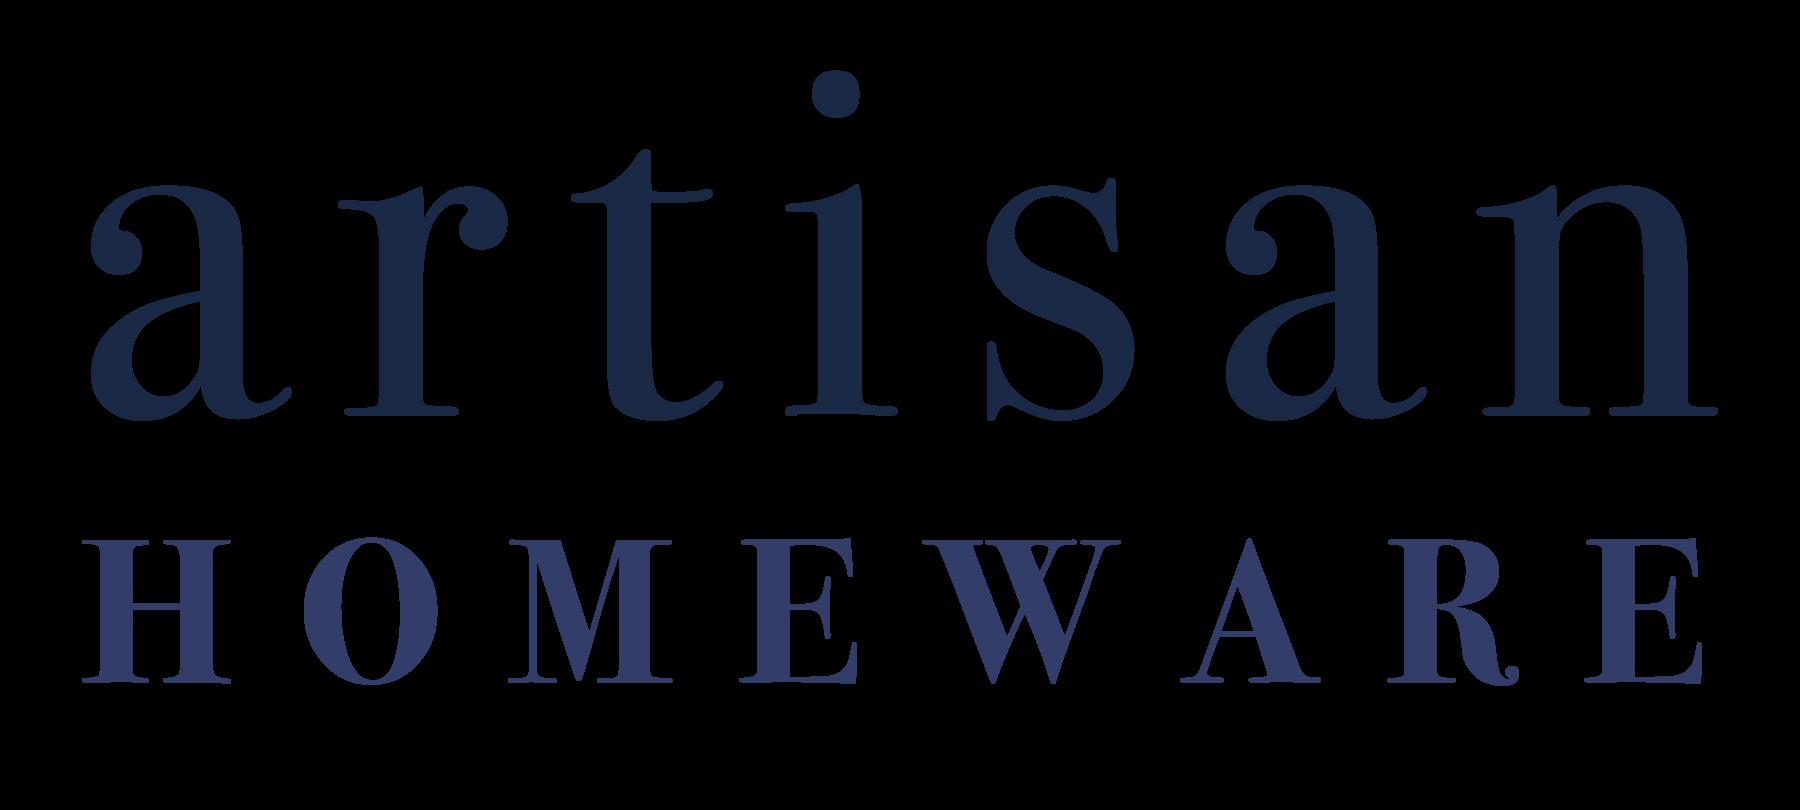 Bristol Marketing Company. Creative web design agency. Professional video promotions. Marketing company Bedminster Bristol. Marketing agency Clifton Bristol.